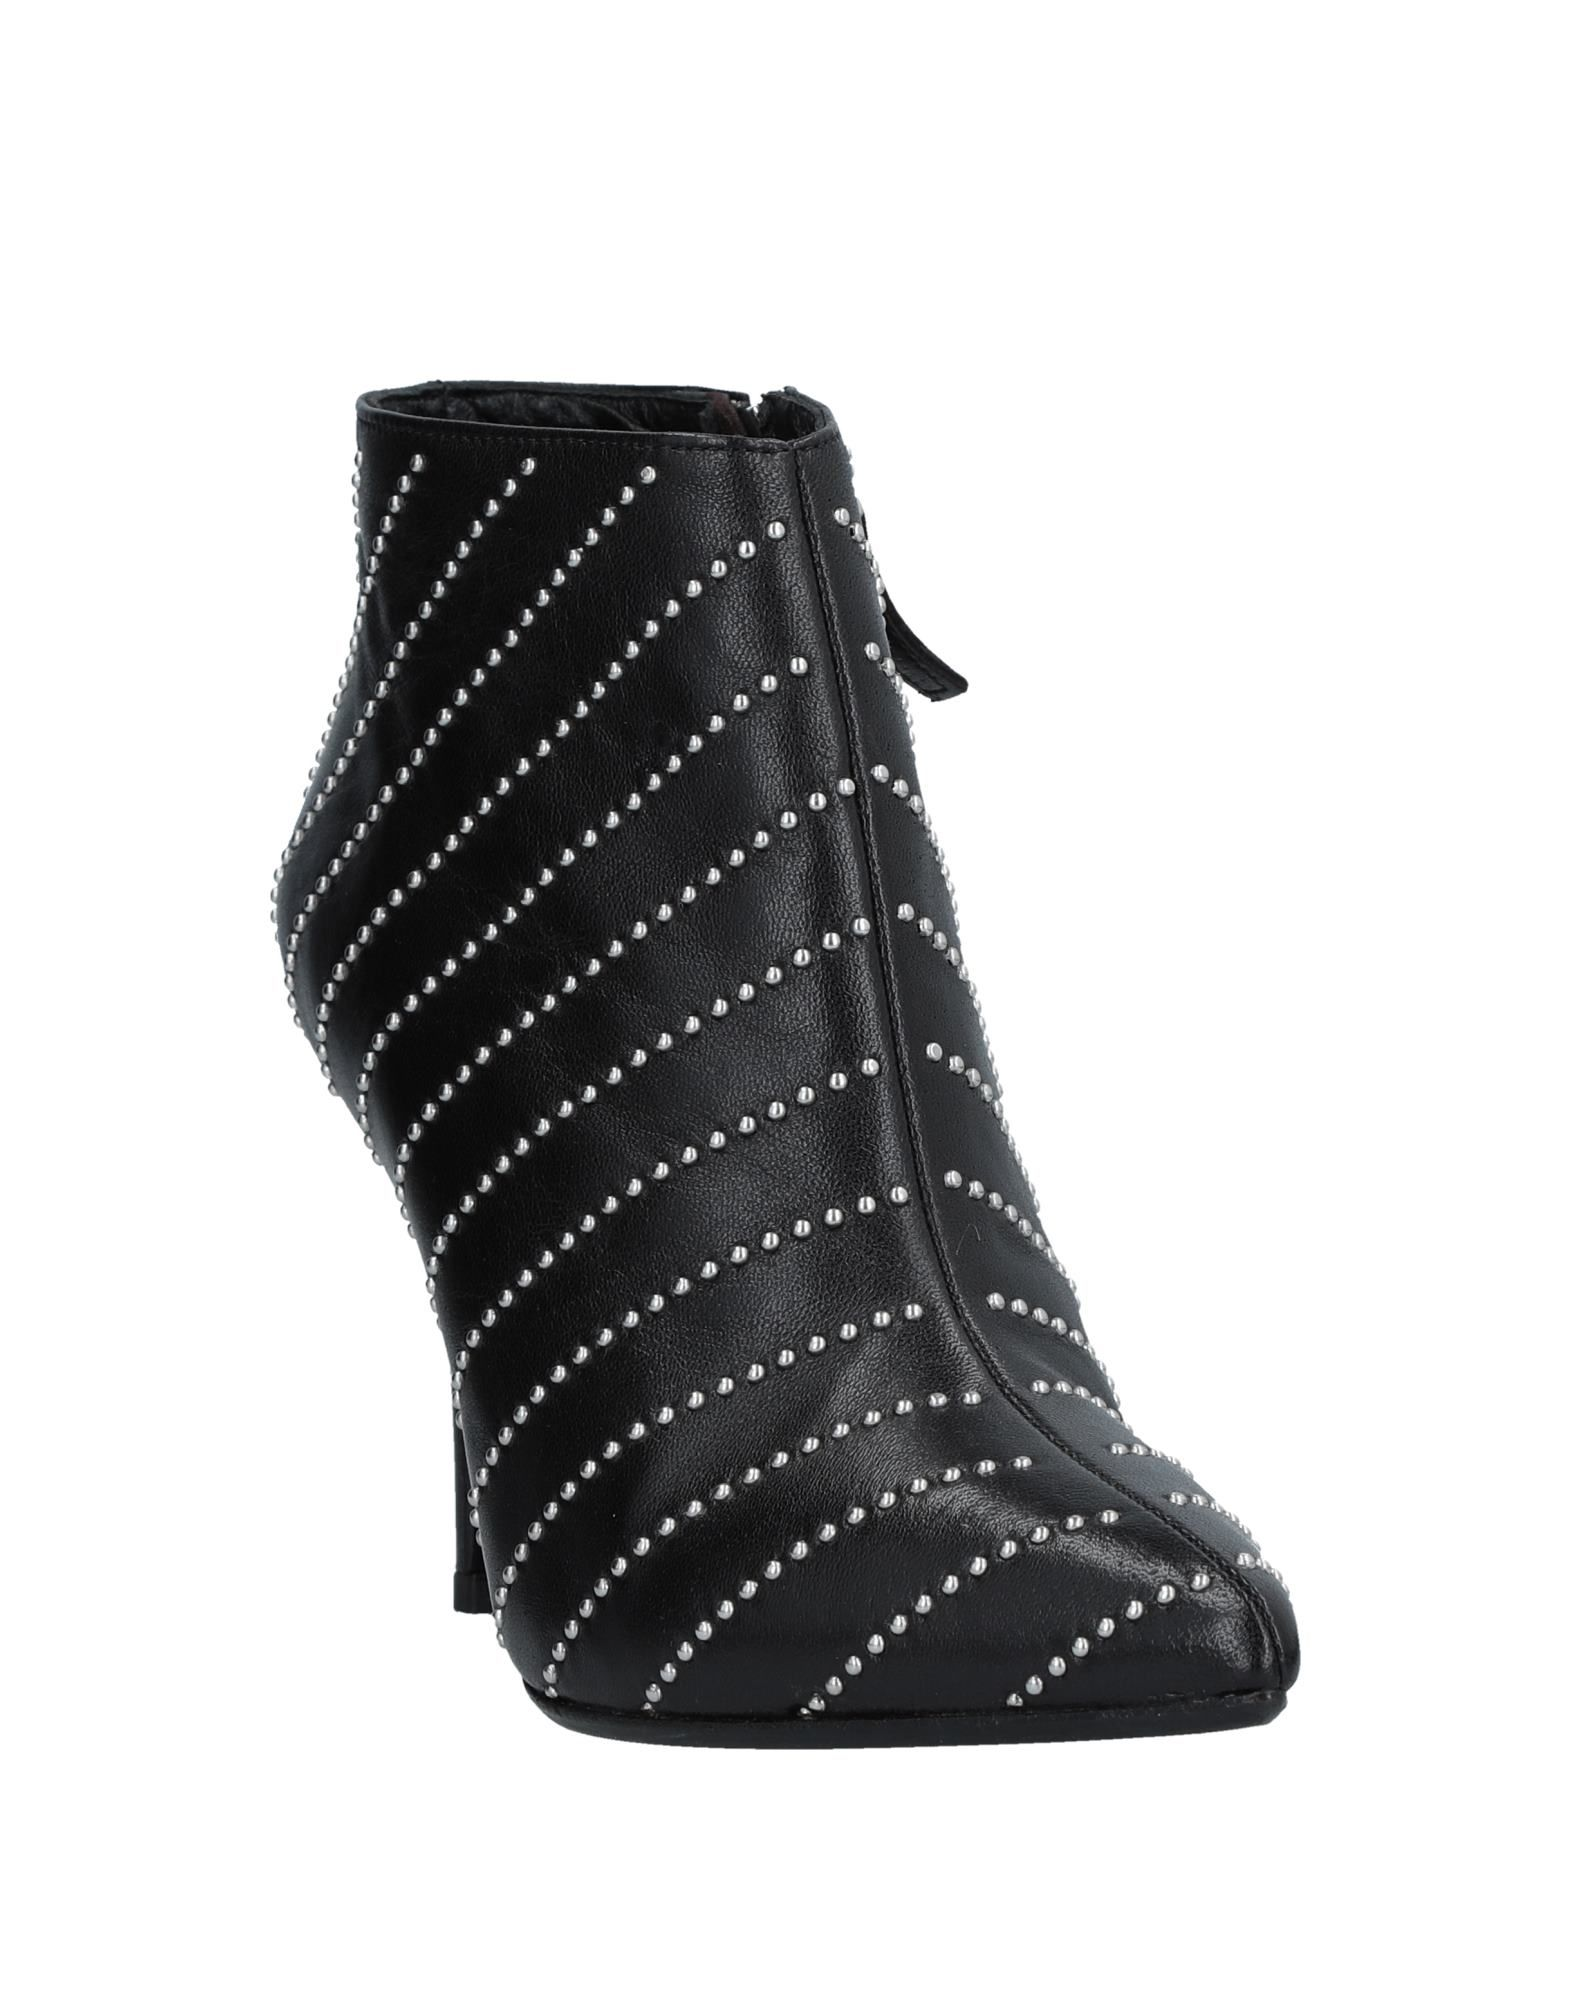 Chantal Stiefelette strapazierfähige Damen  11533914NWGut aussehende strapazierfähige Stiefelette Schuhe a56068